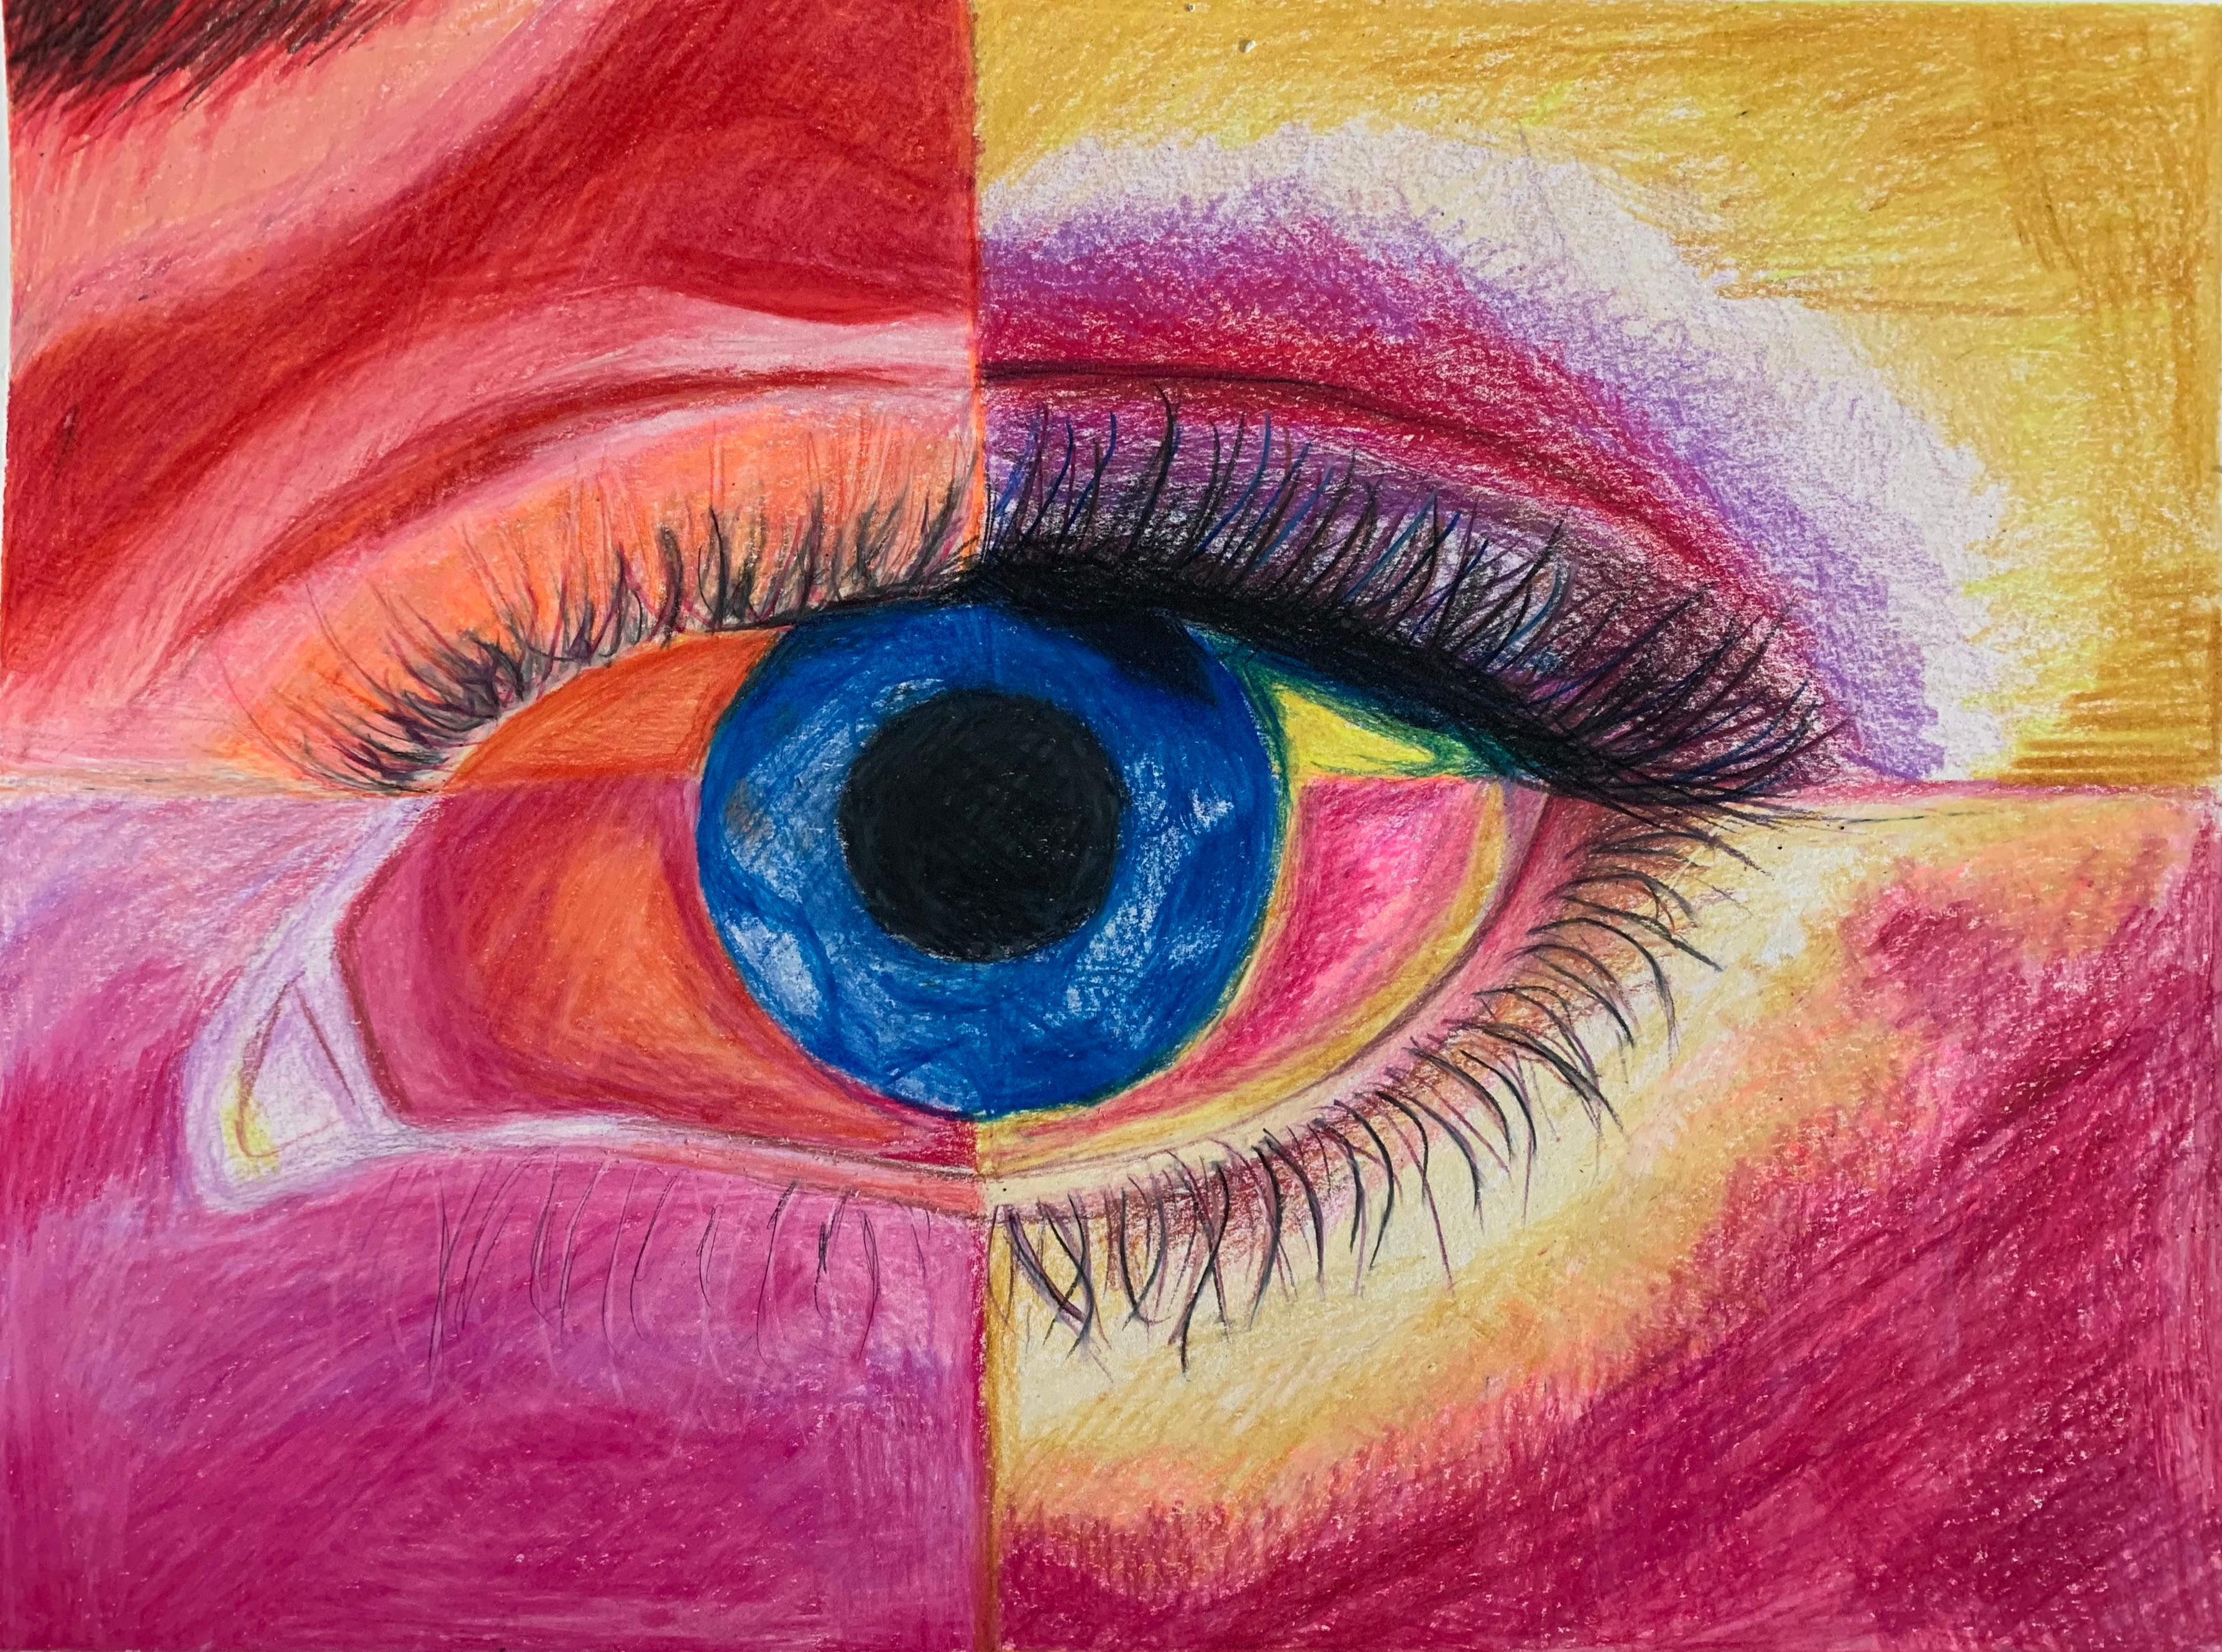 Friday 3pm - 5pm, 2D Media Art Class